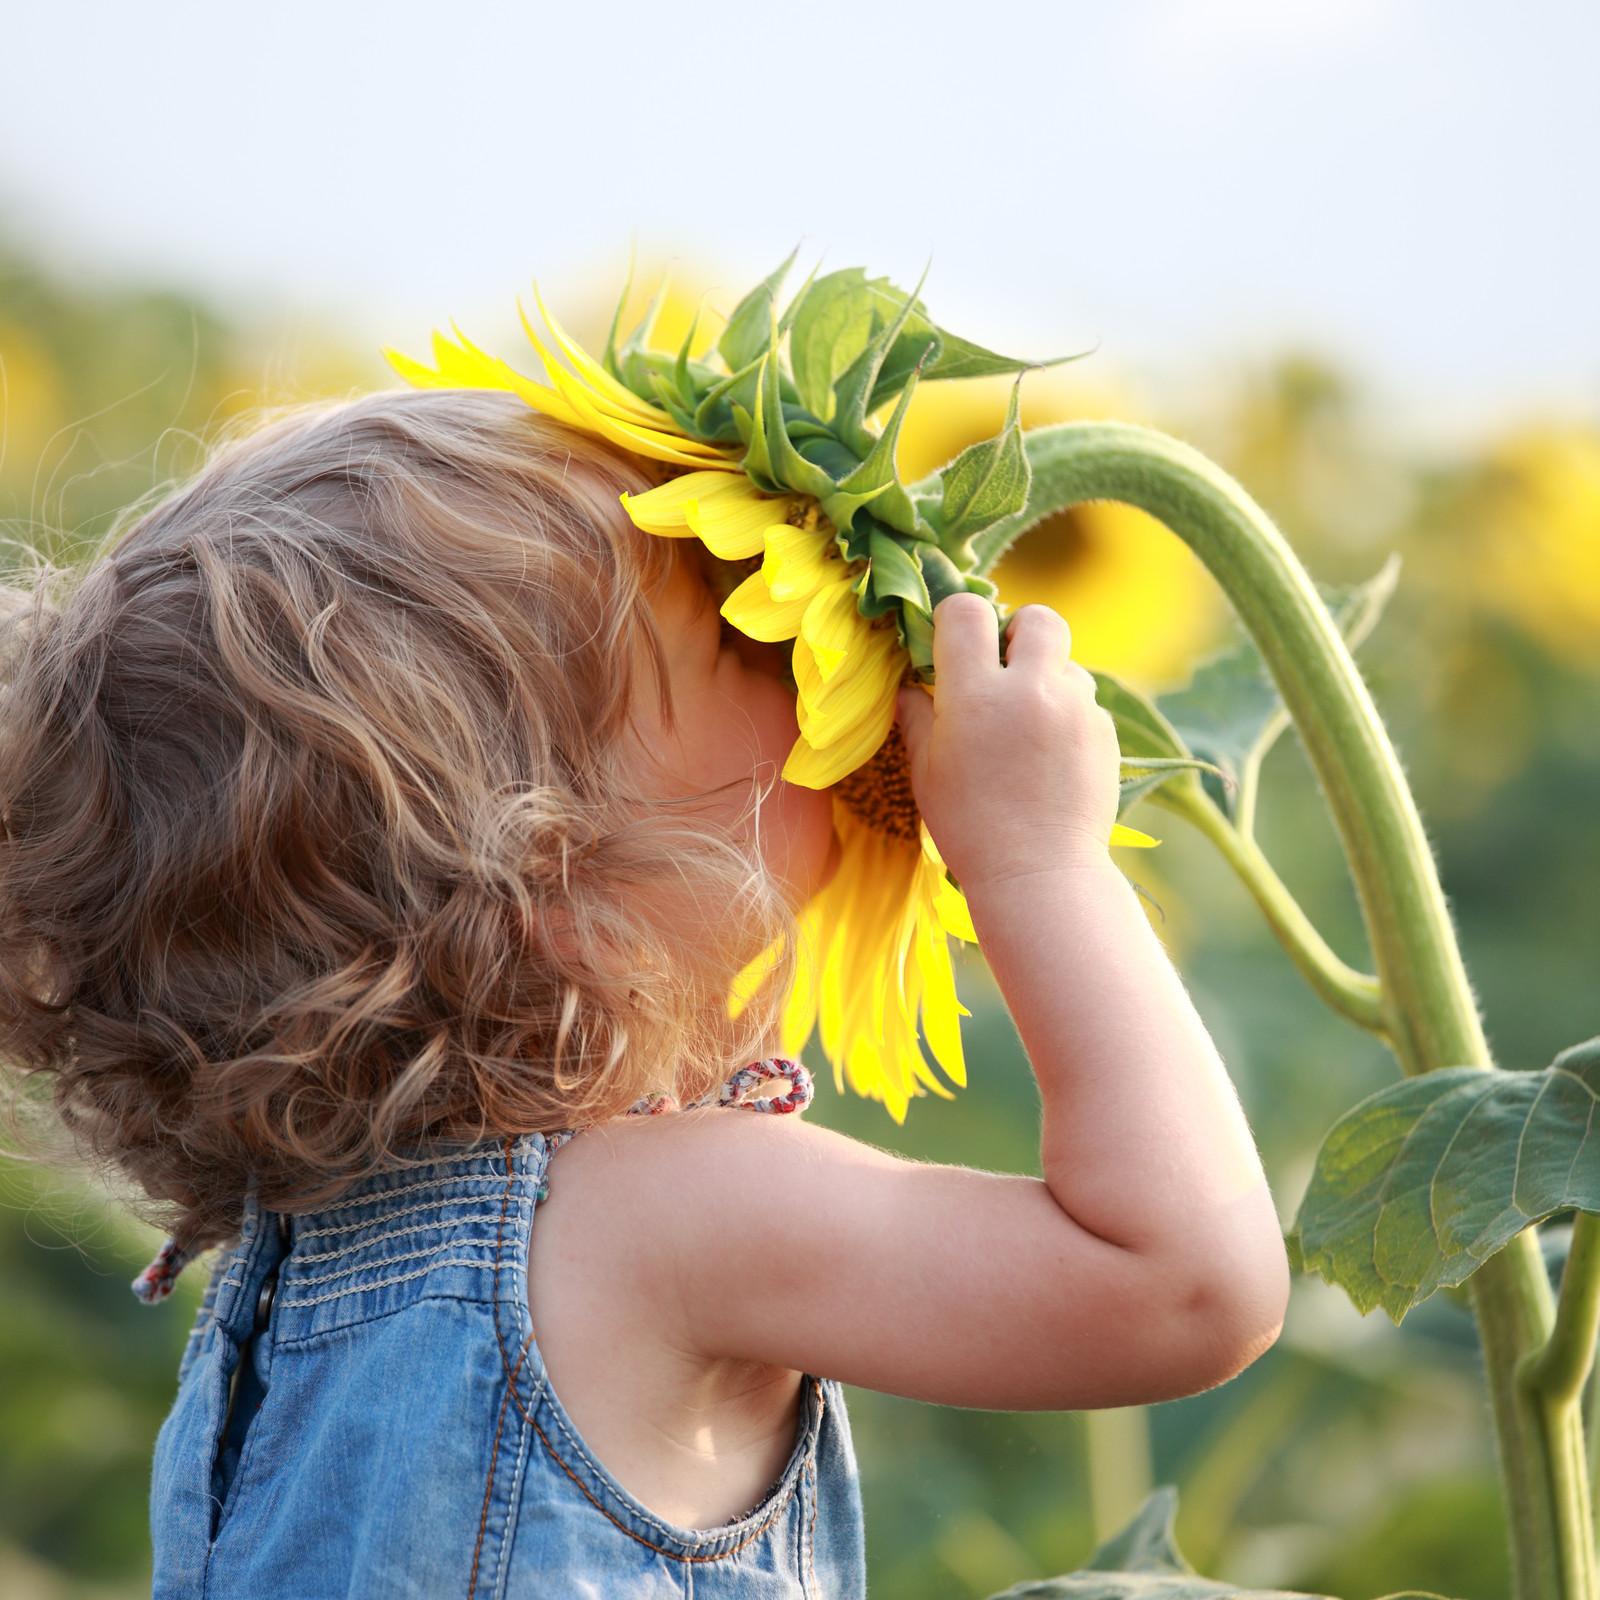 Embrace nature in sunblocks